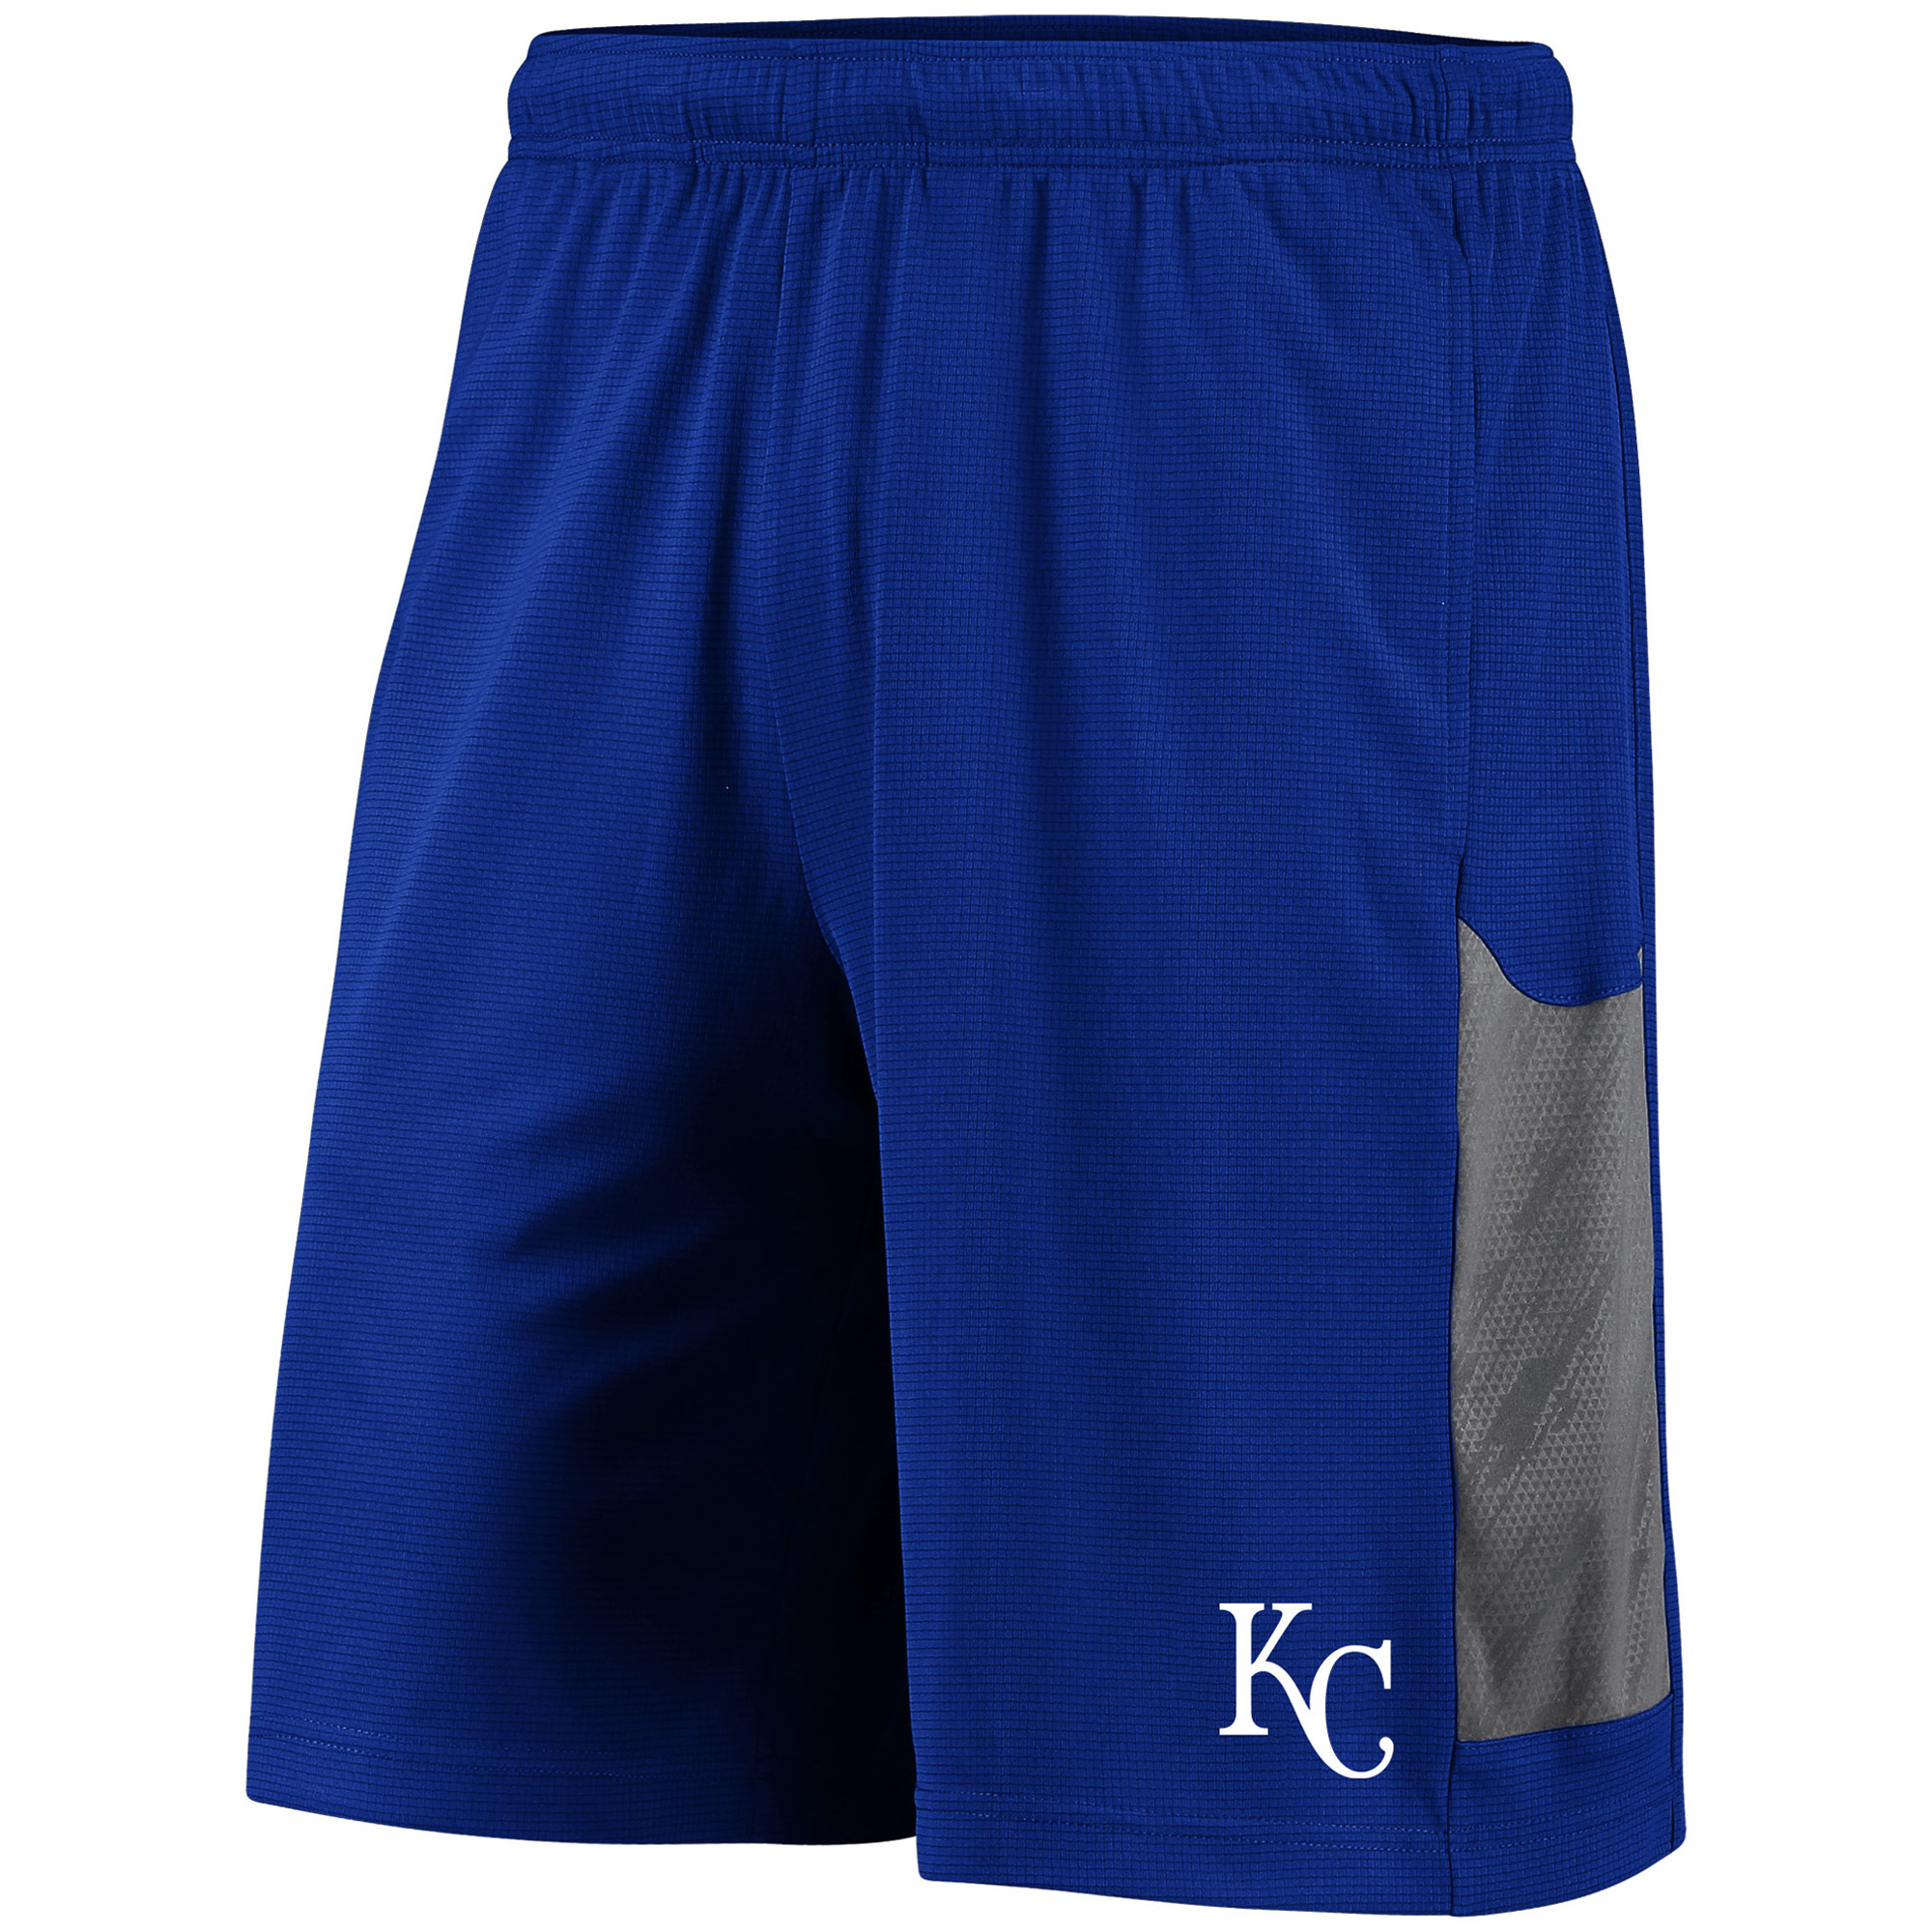 Men's Majestic Royal/Gray Kansas City Royals TX3 Cool Tech Shorts